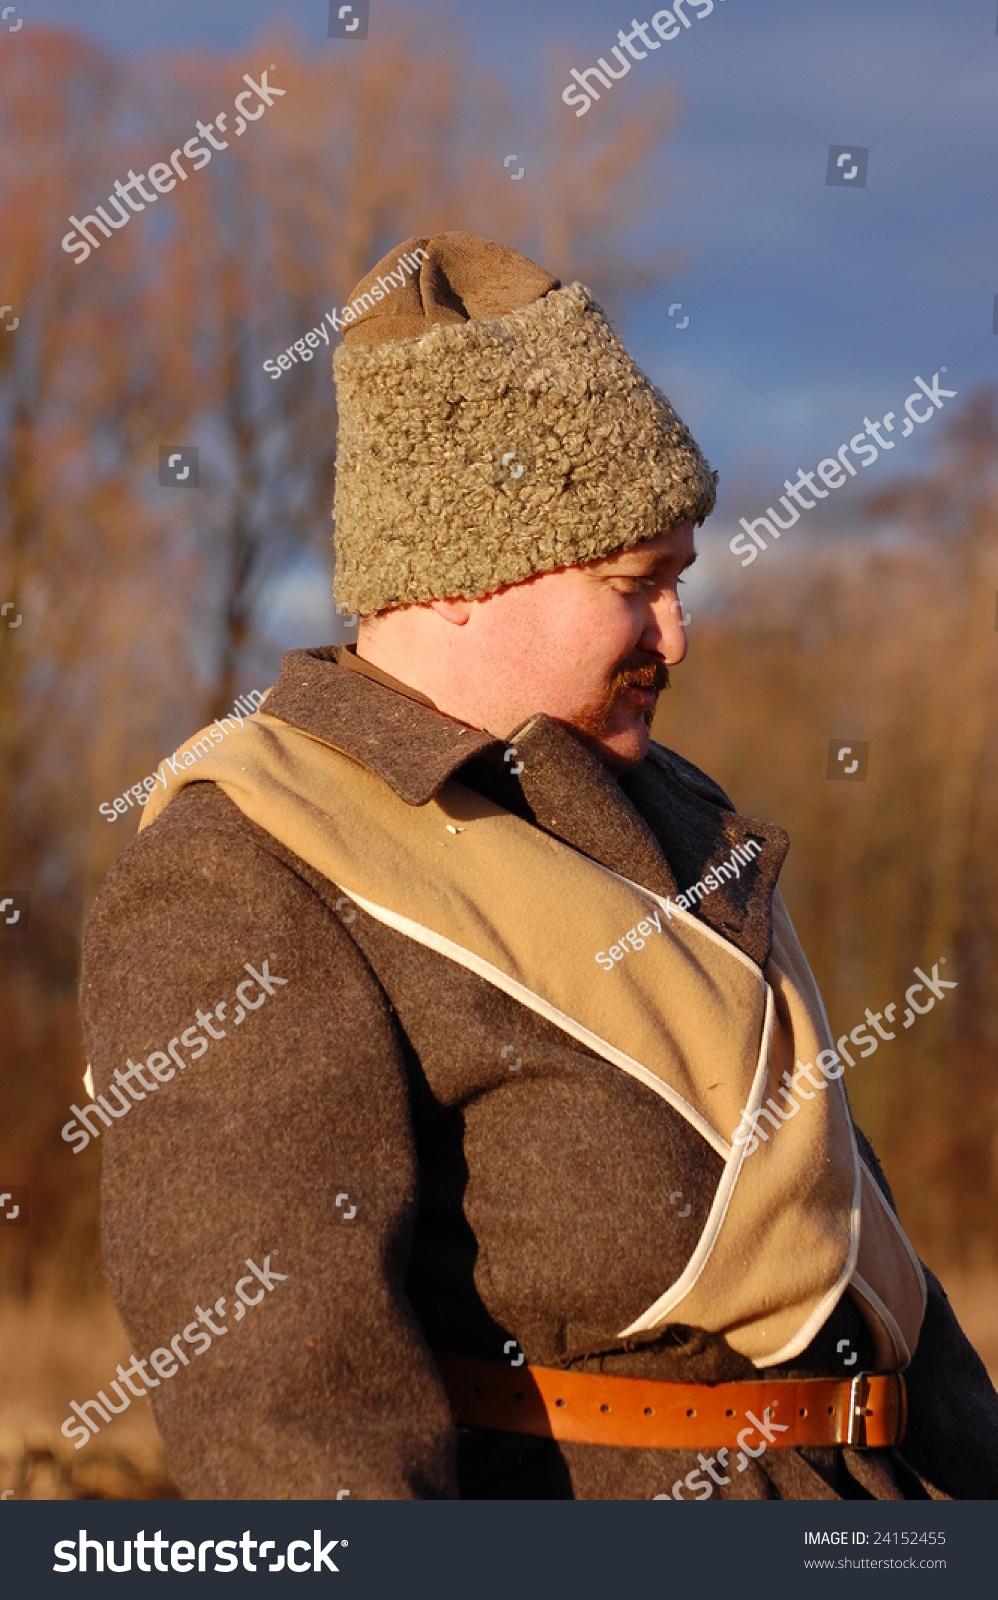 KIEV, UKRAINE - FEBRUARY 2, 2008. A member of the military history reenactment club, Red Star, wears a recreation of historical military Russian Civil War uniform circa 1918 in Kiev, Ukraine on February 2, 2008.